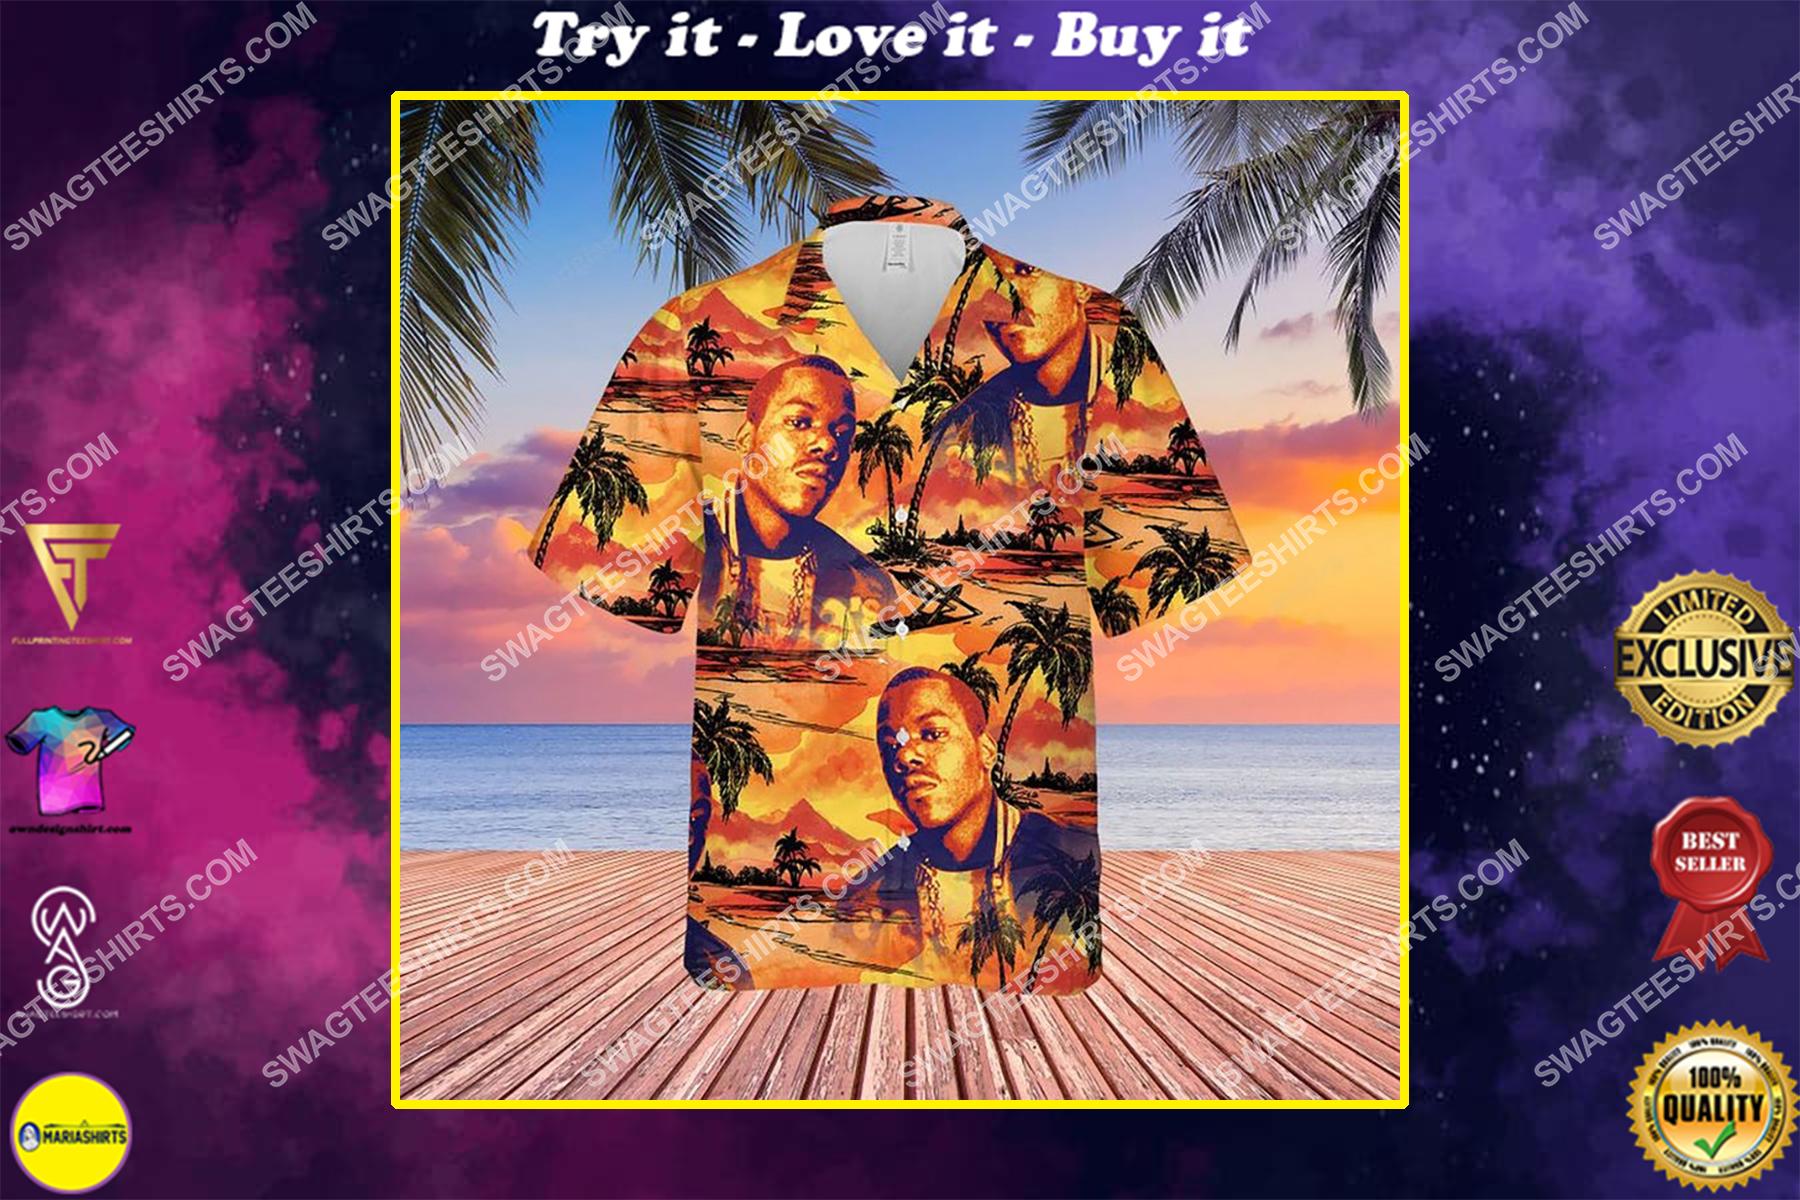 Todd anthony shaw too short rapper hawaiian shirt